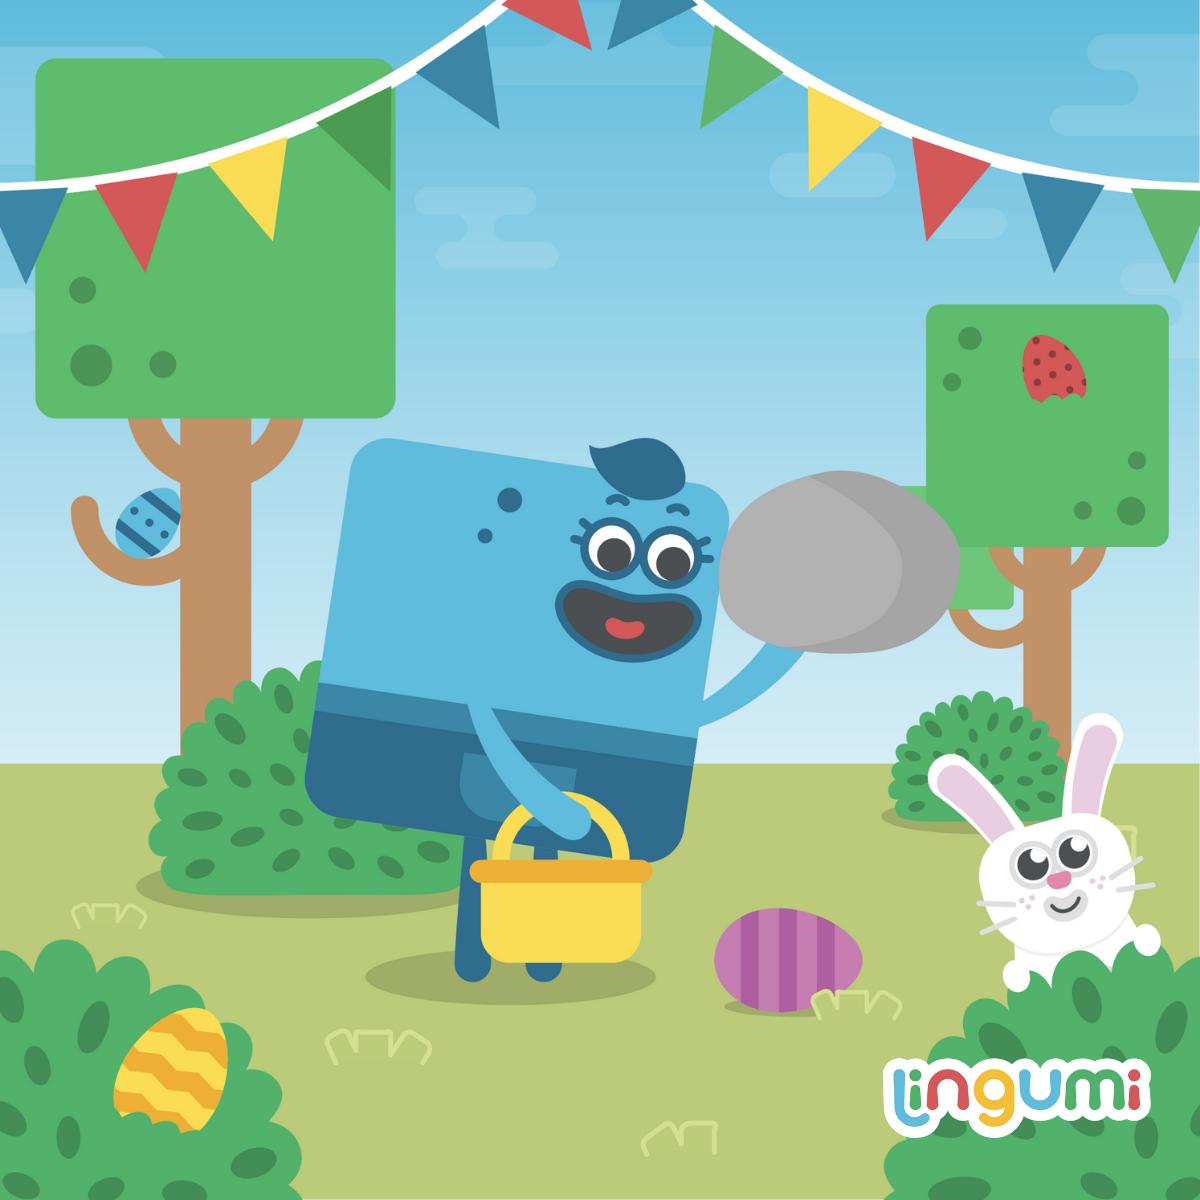 尋找復活節彩蛋 Easter egg hunt